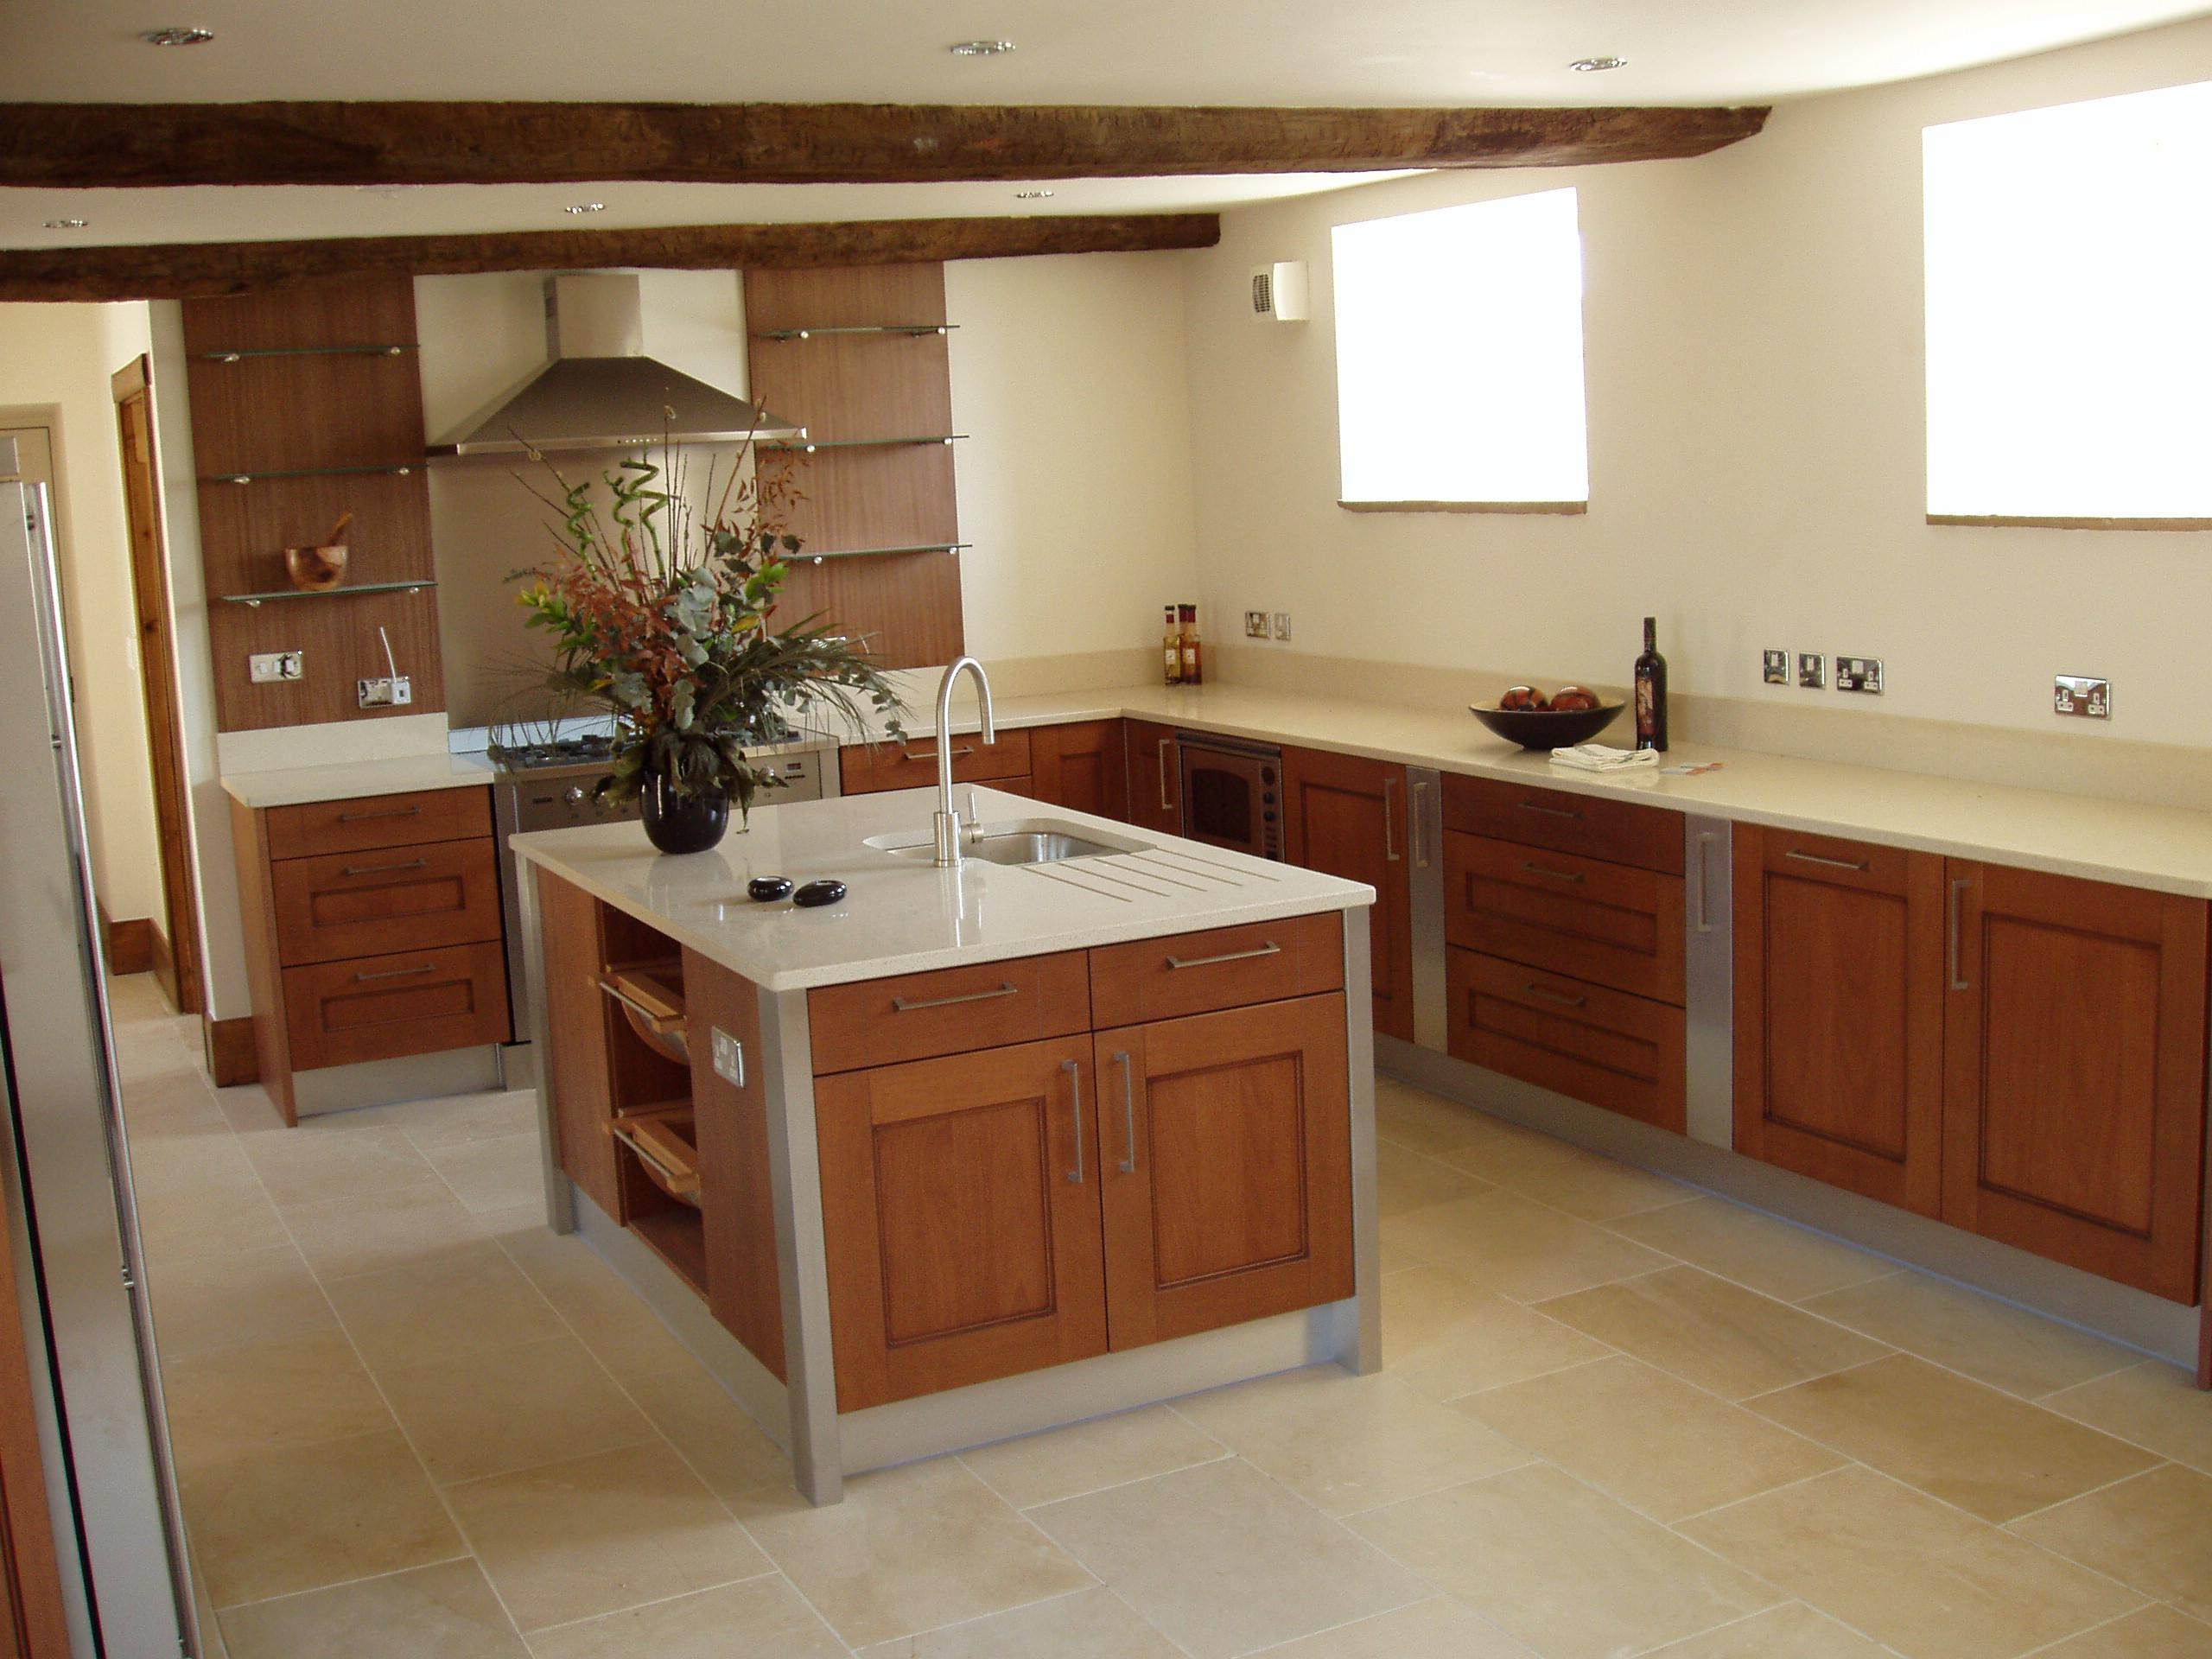 теплый пол на кухне под плитку